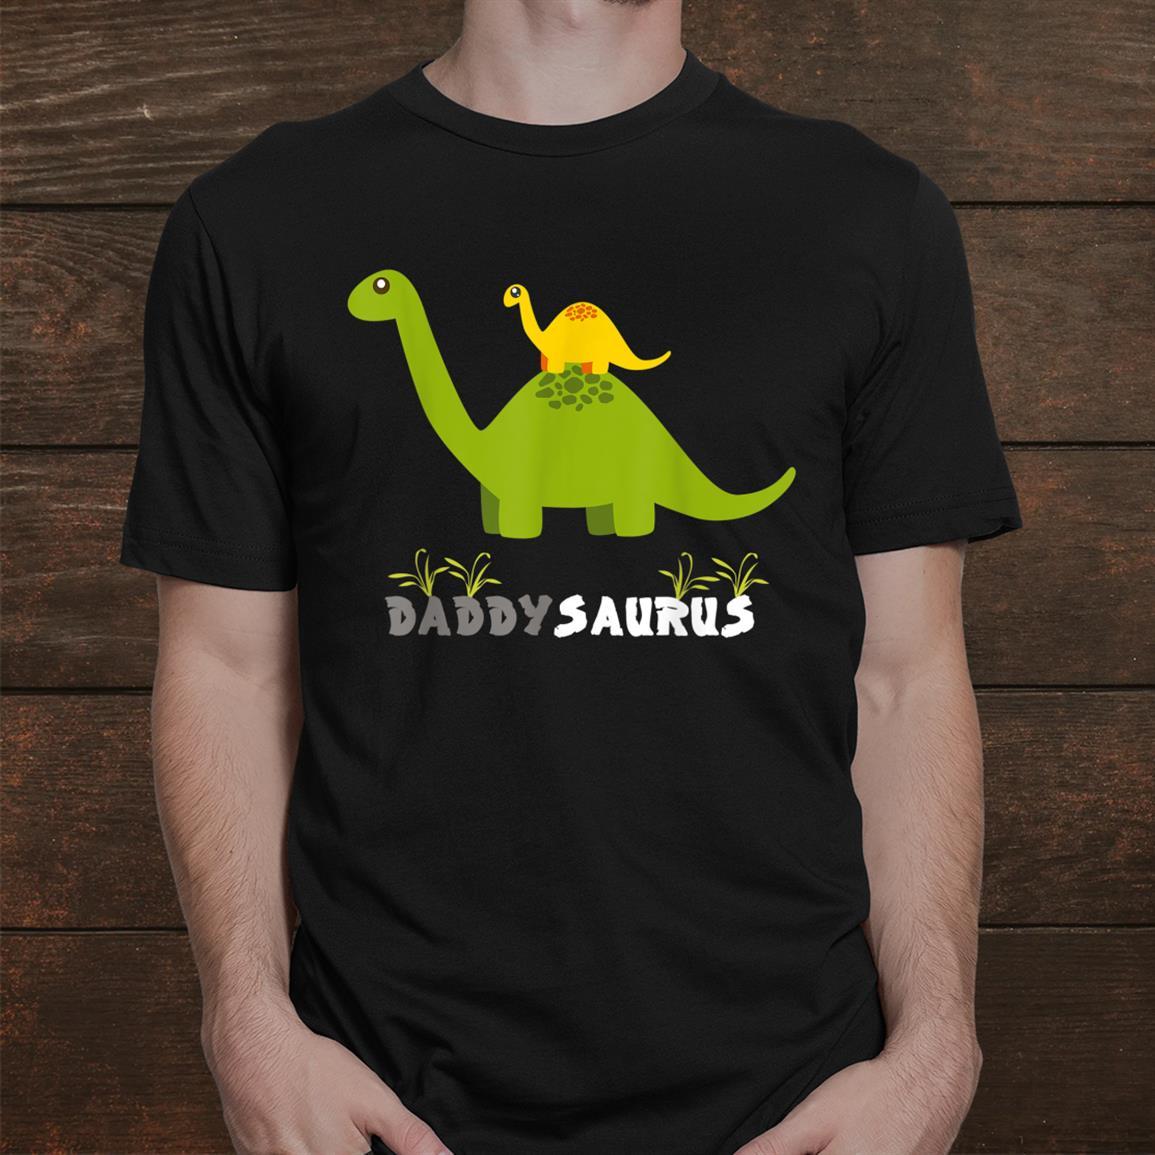 Daddysaurus Shirt Funny Father Dinosaur Daddy Saurus Shirt